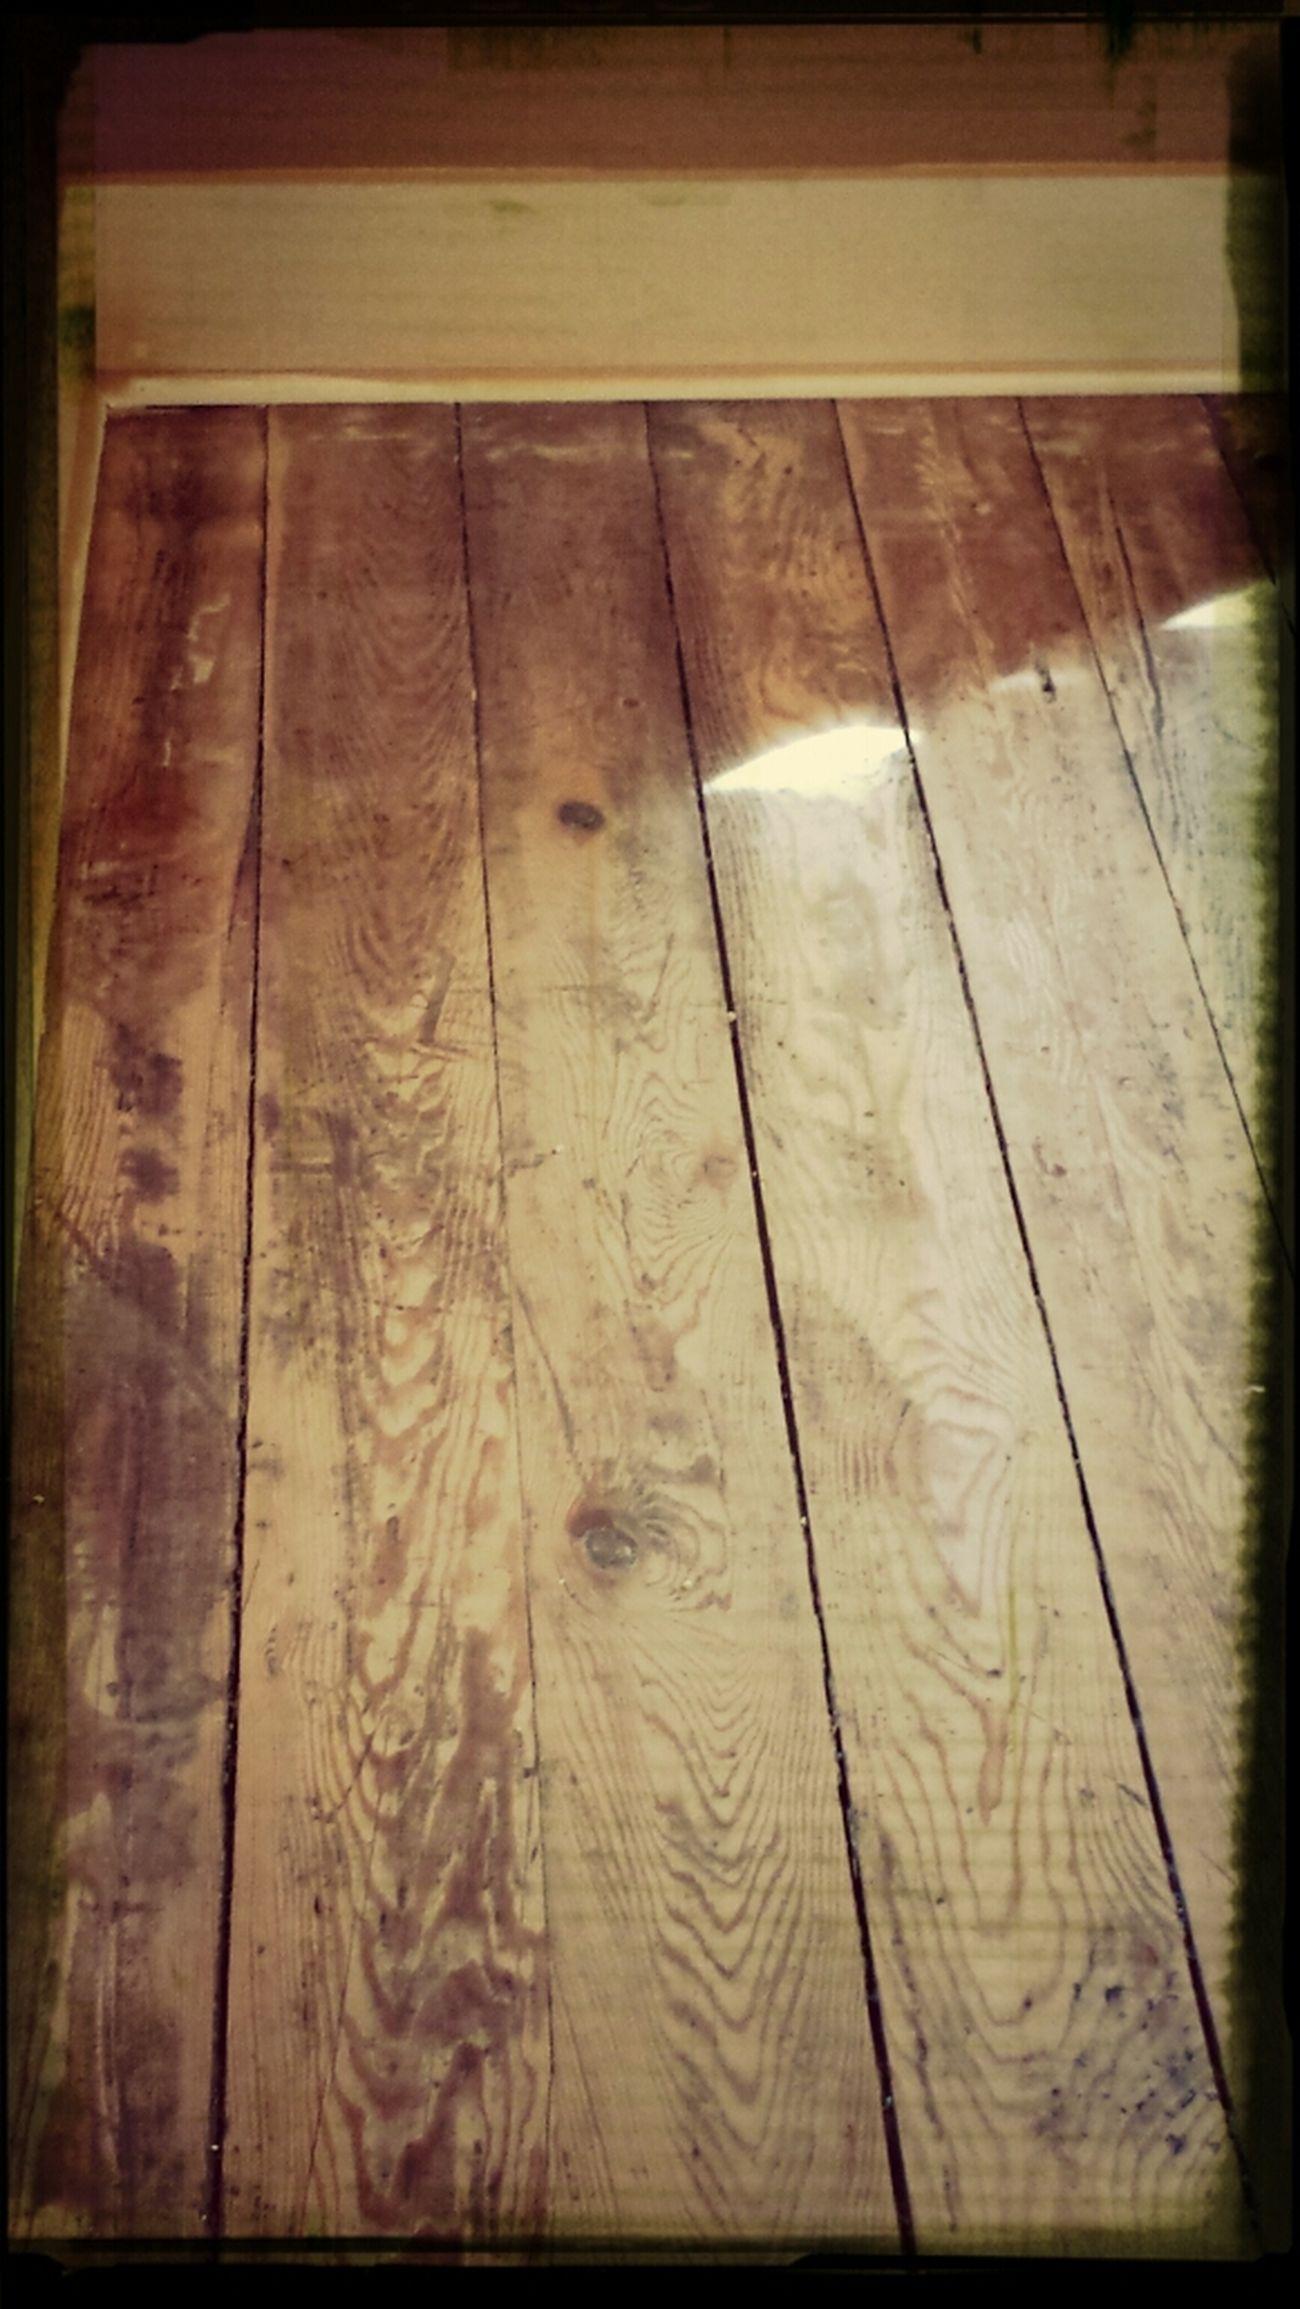 refinishing hardwood floors day!